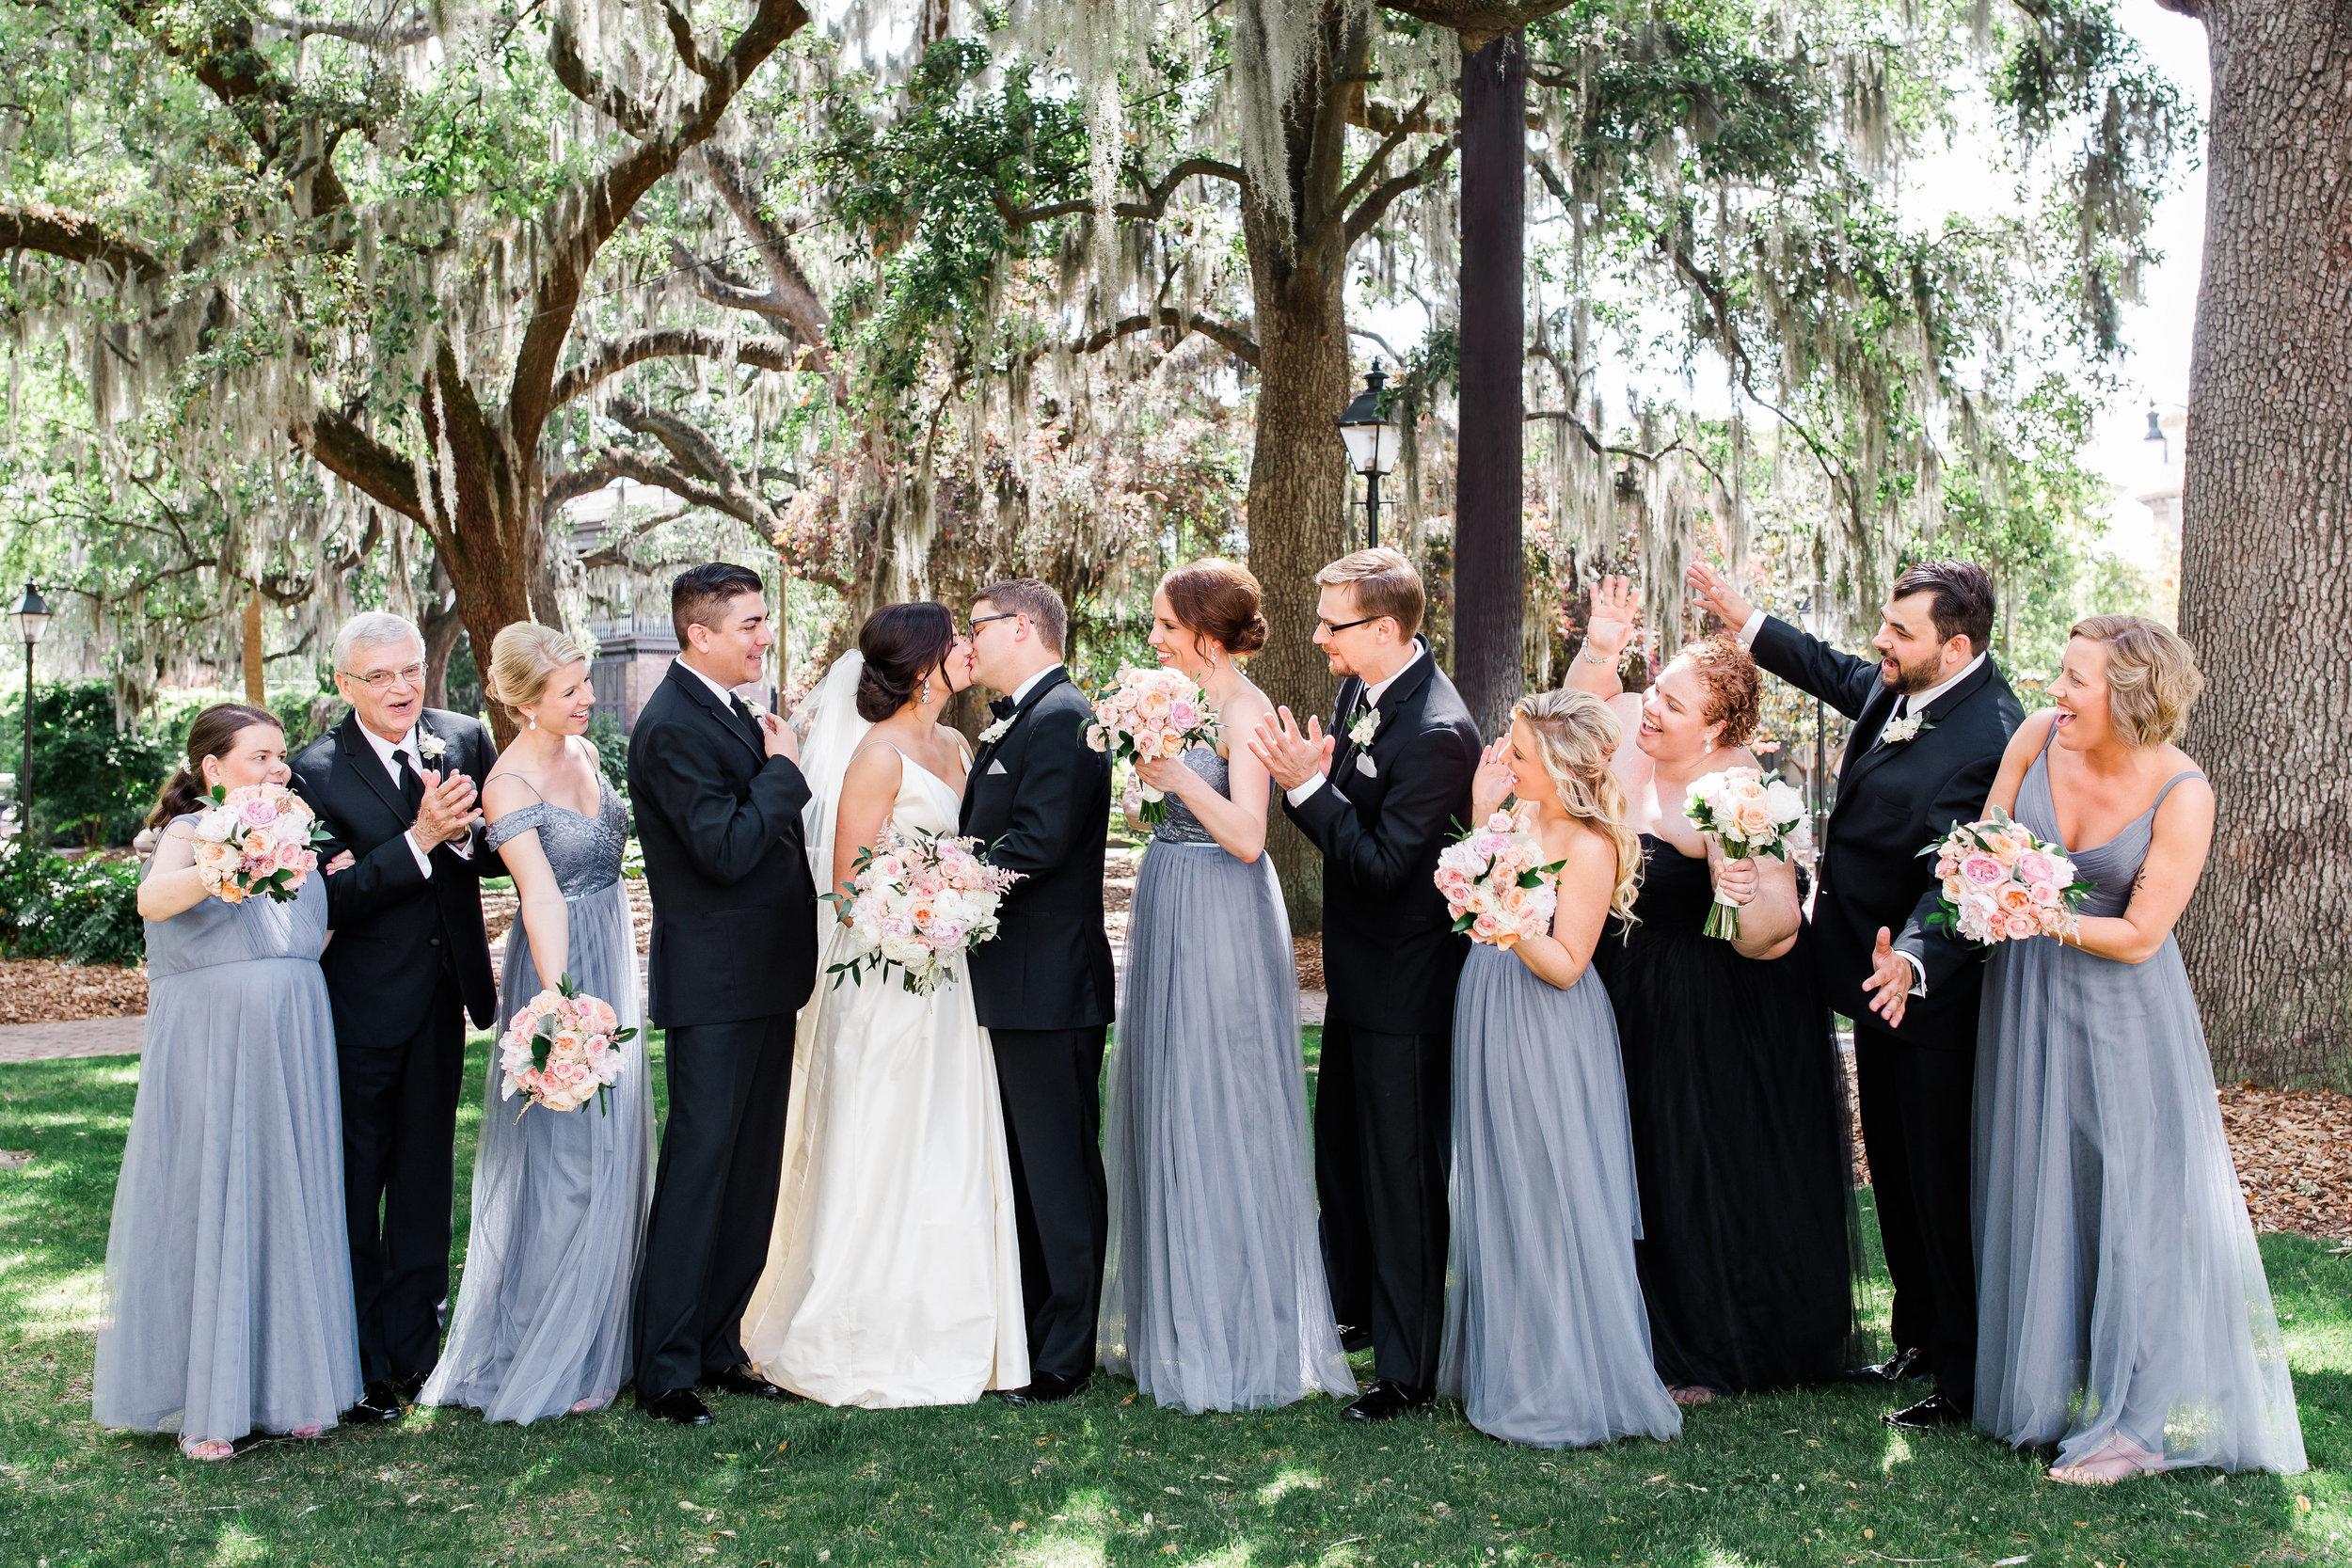 savannah-bridal-shop-ivory-and-beau-bridesmaids-meagans-bride-tribe-jb-marie-photography-jenny-yoo-bridesmaids-savannah-bridesmaids-dresses-savannah-bridesmaids-gowns-2.JPG